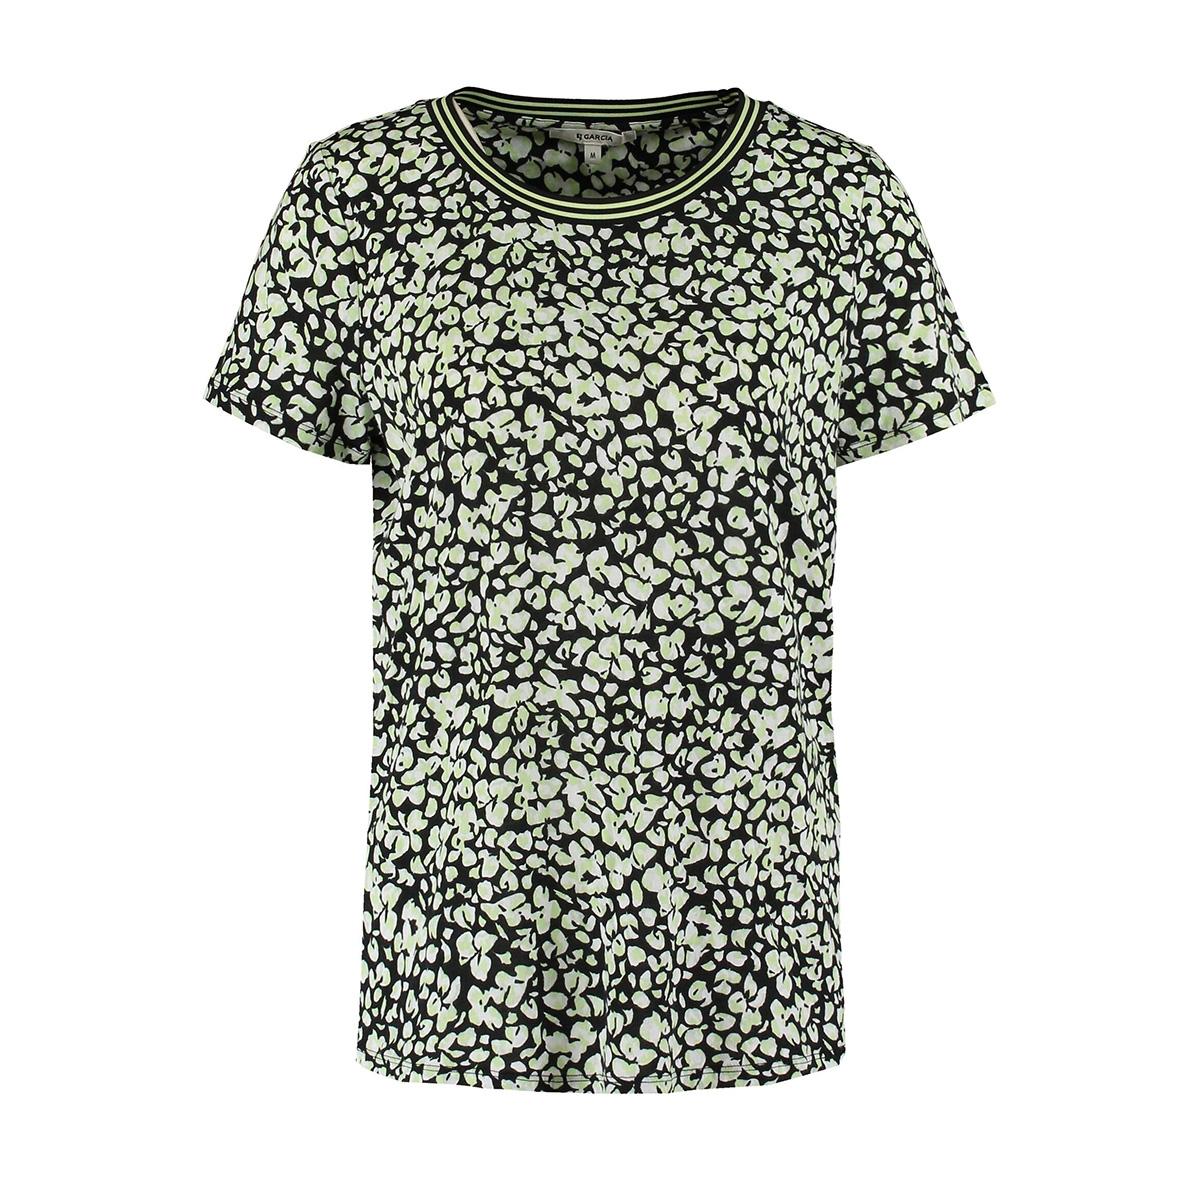 t shirt p00216 garcia t-shirt 60 black